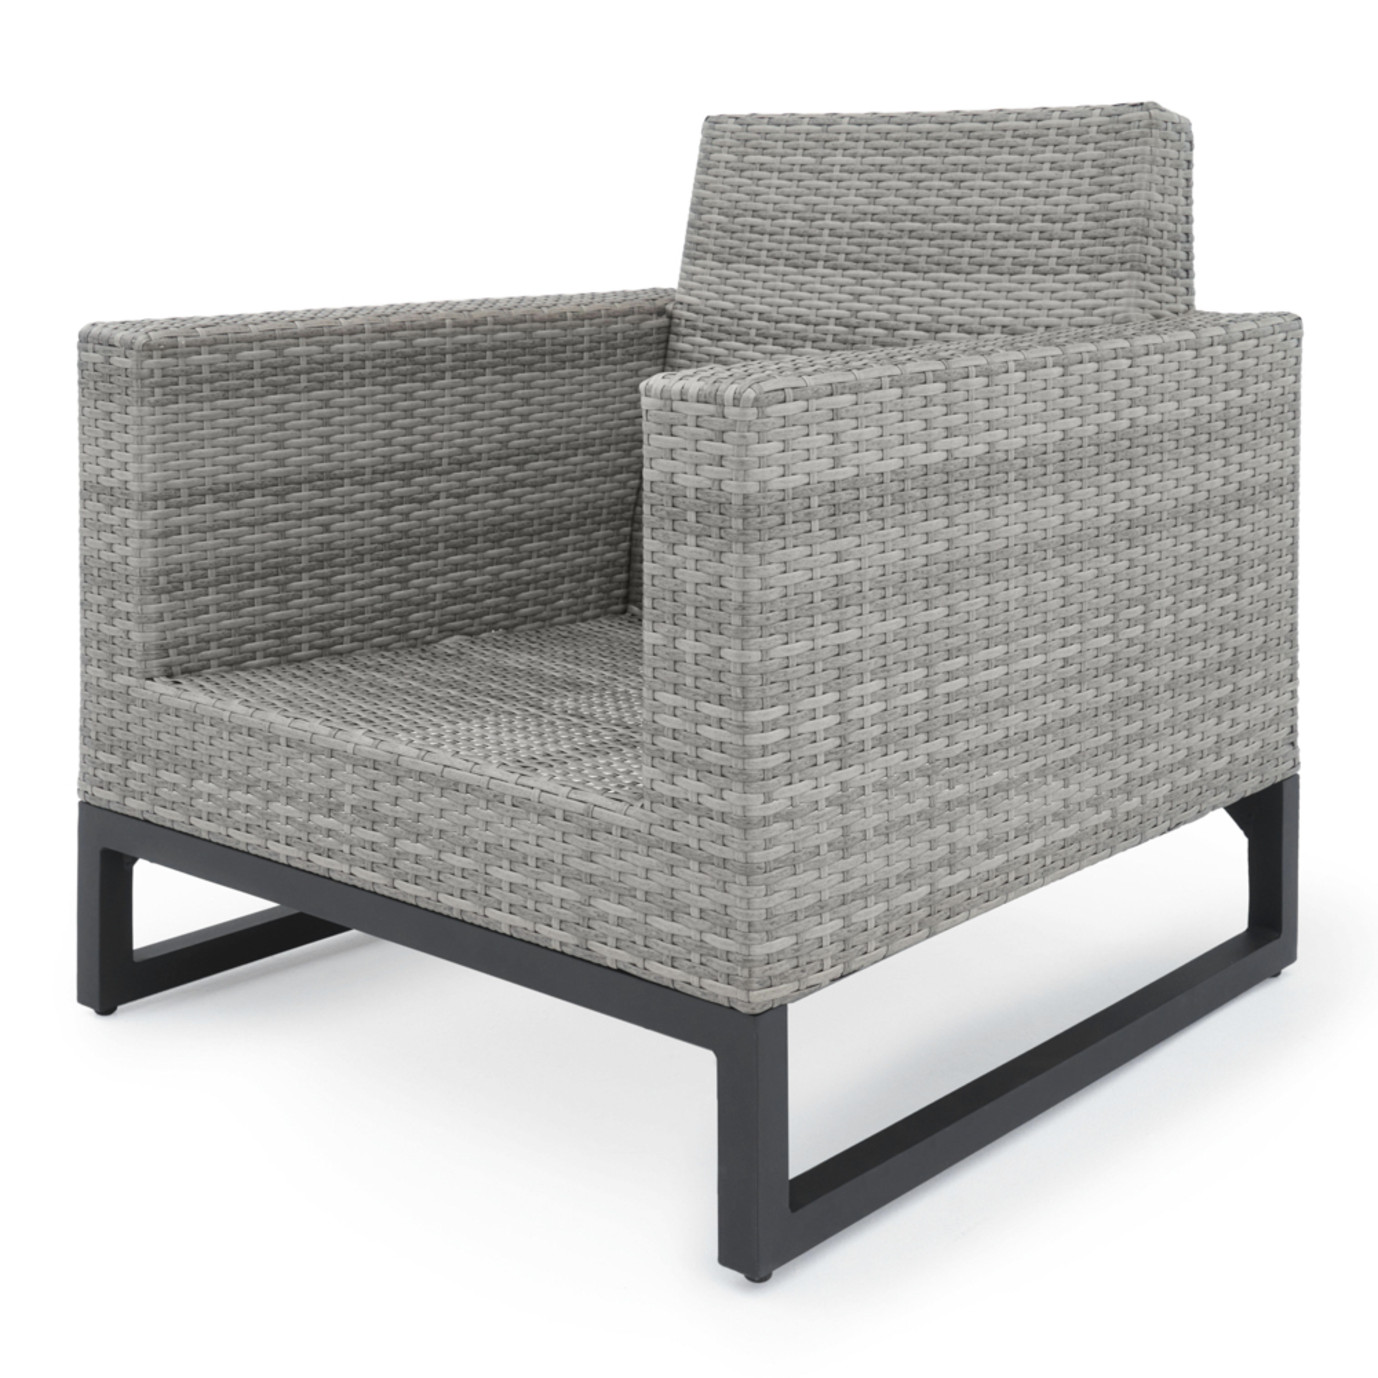 Milo™ Gray 7pc Deep Seating Set -Navy Blue